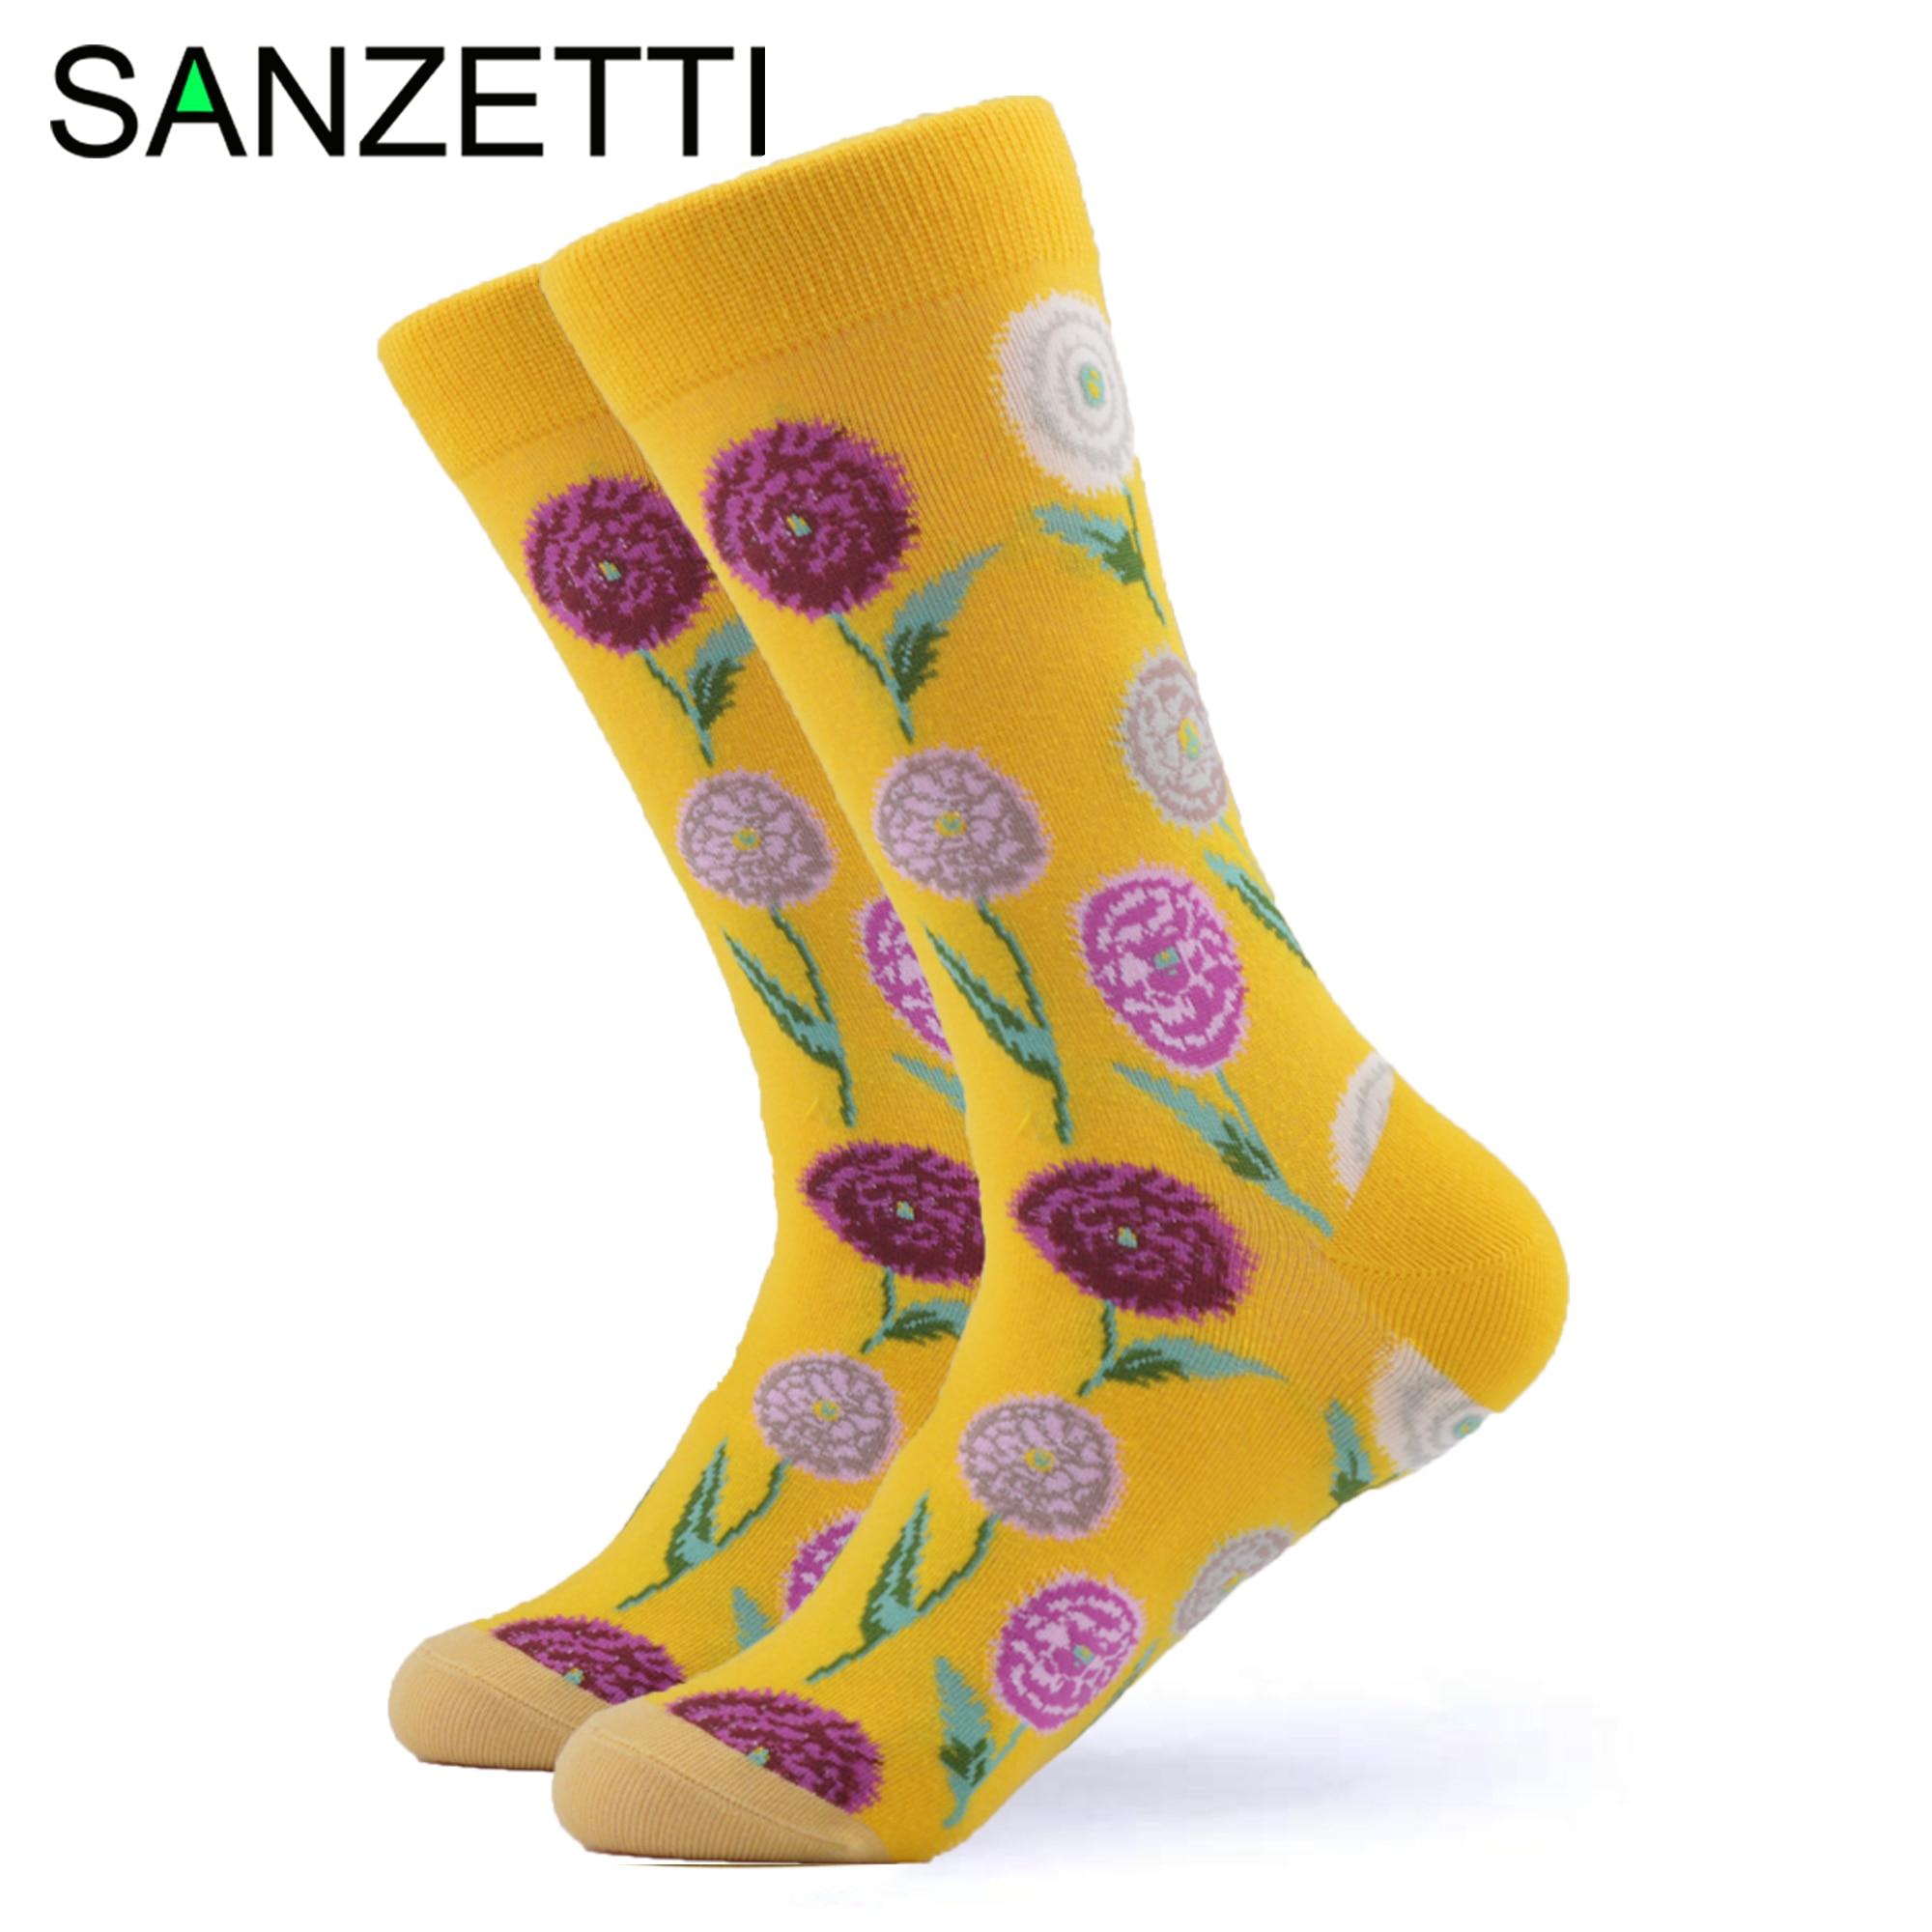 SANZETTI 1 Pair Happy Socks High Quality Men Colorful Combed Cotton Fresh Flowers Coconut Tree Gift Pattern Wedding Dress Socks